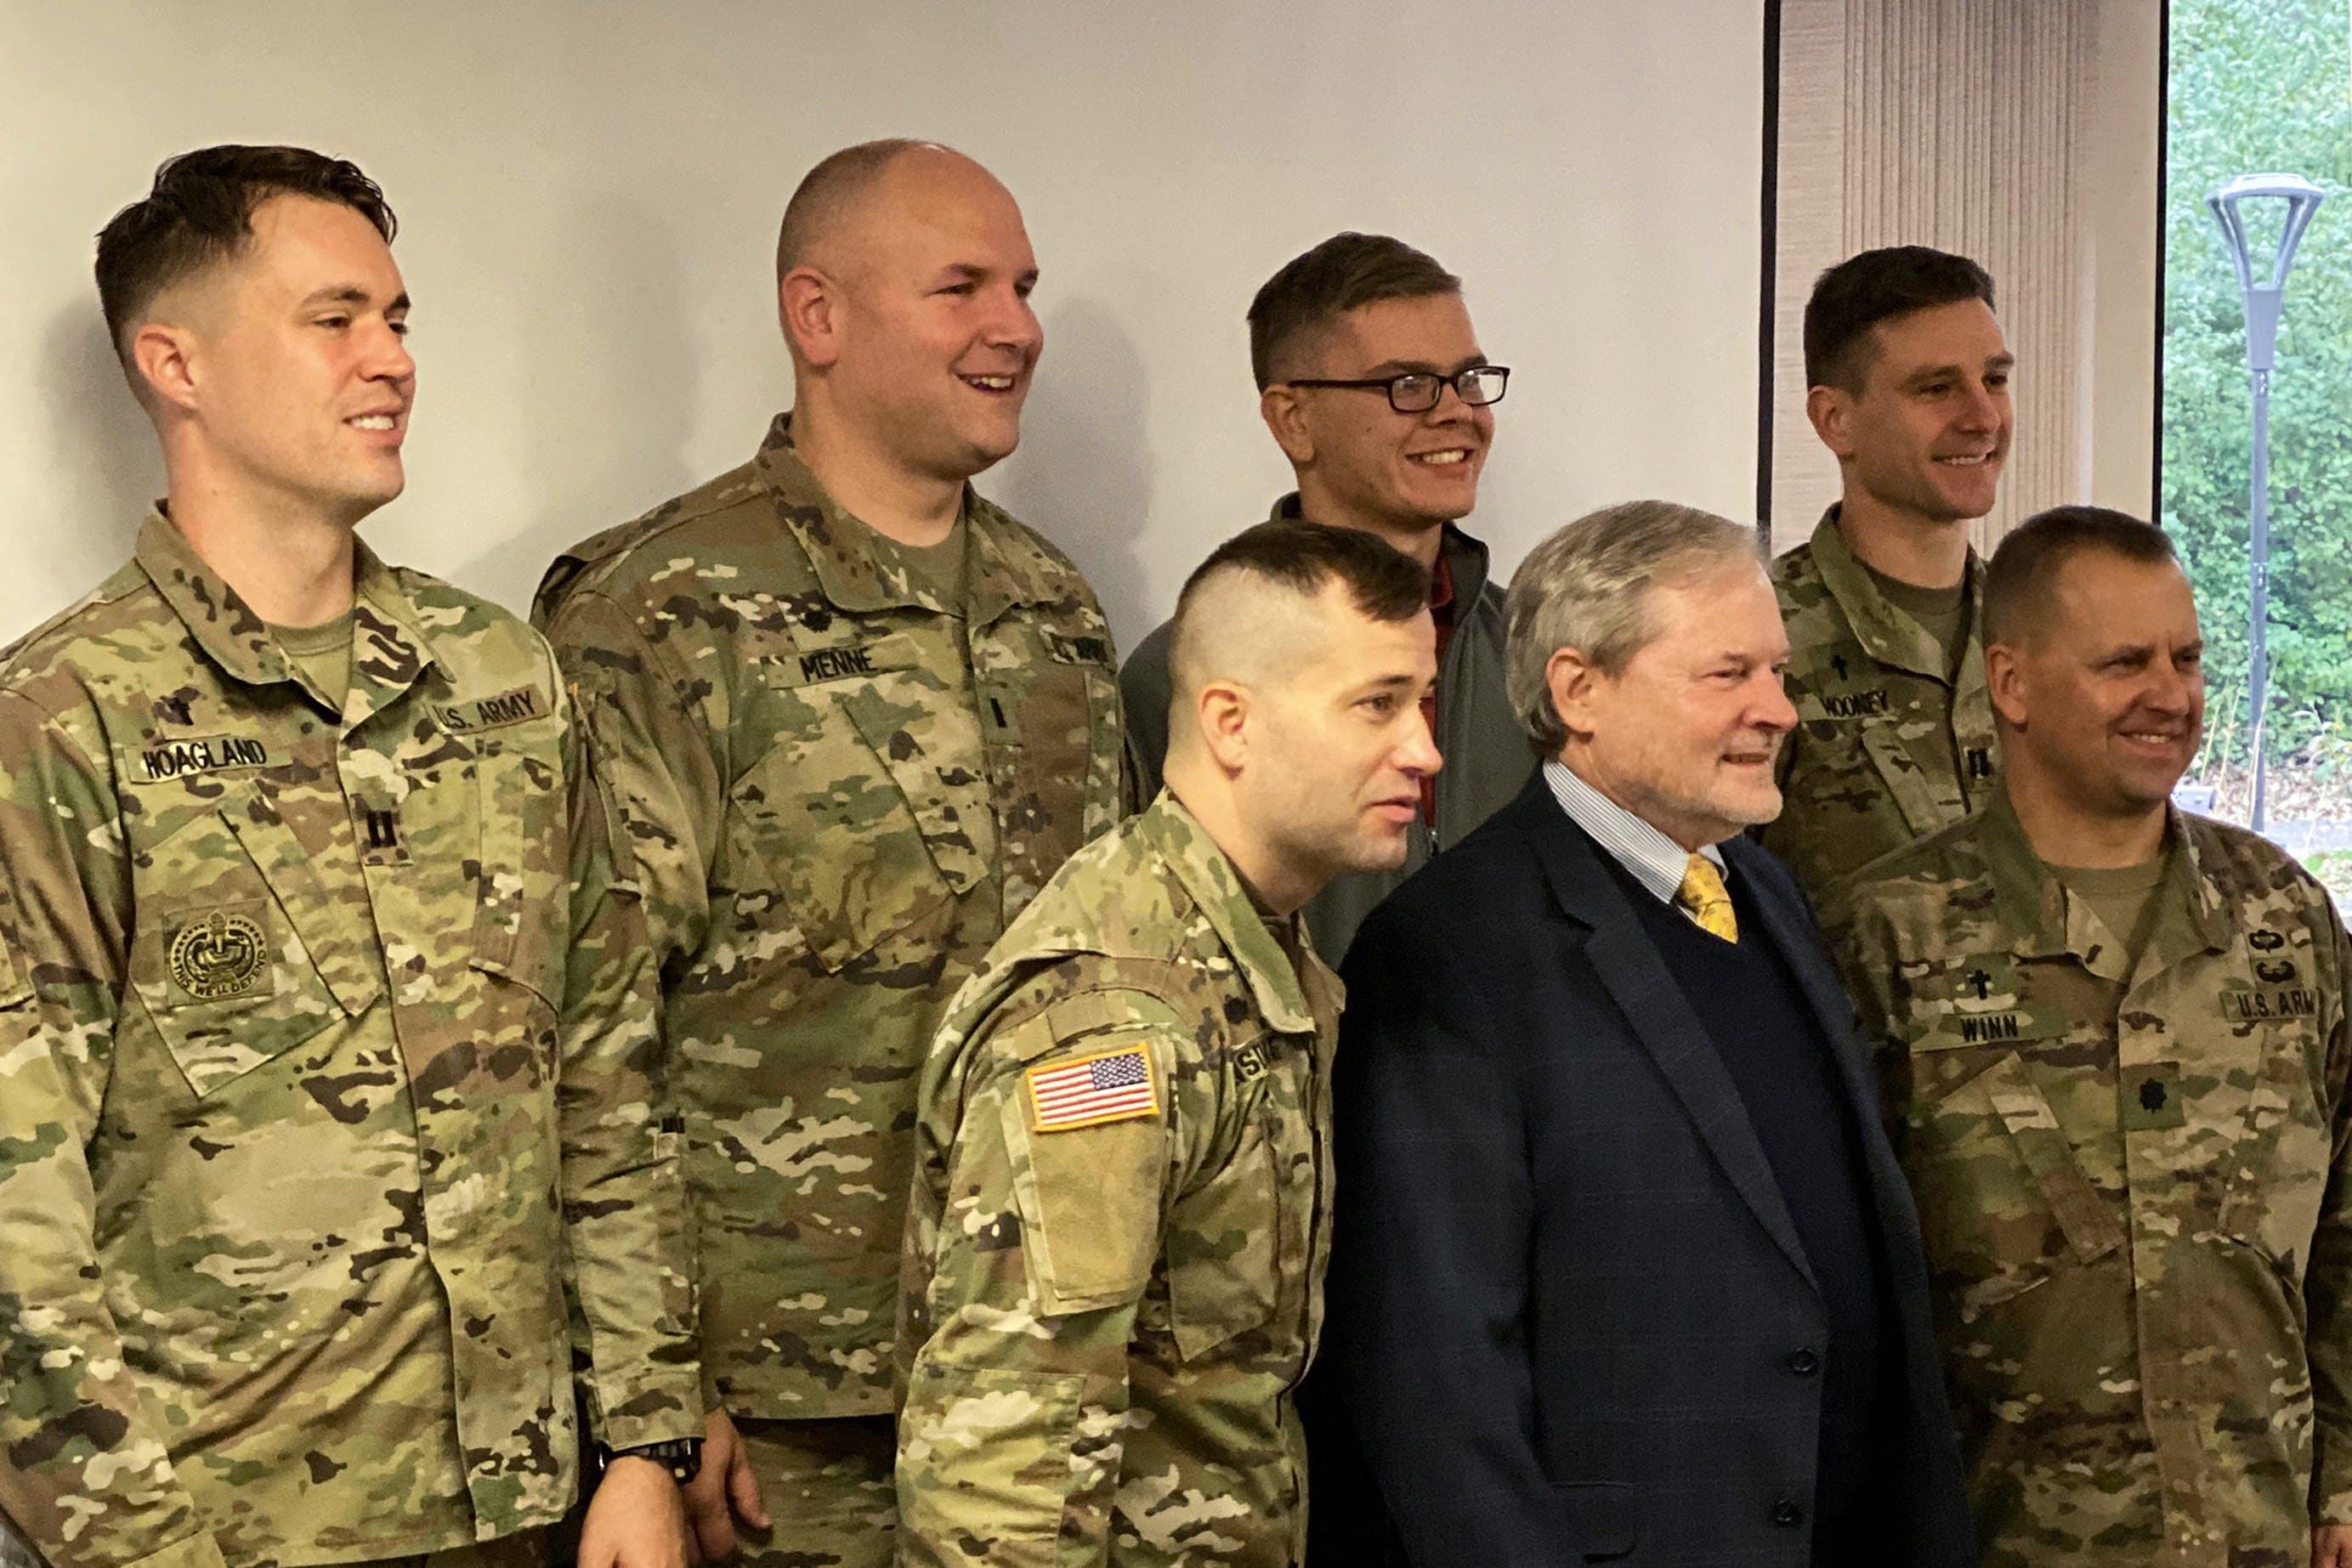 Bethel Honors Military Veterans